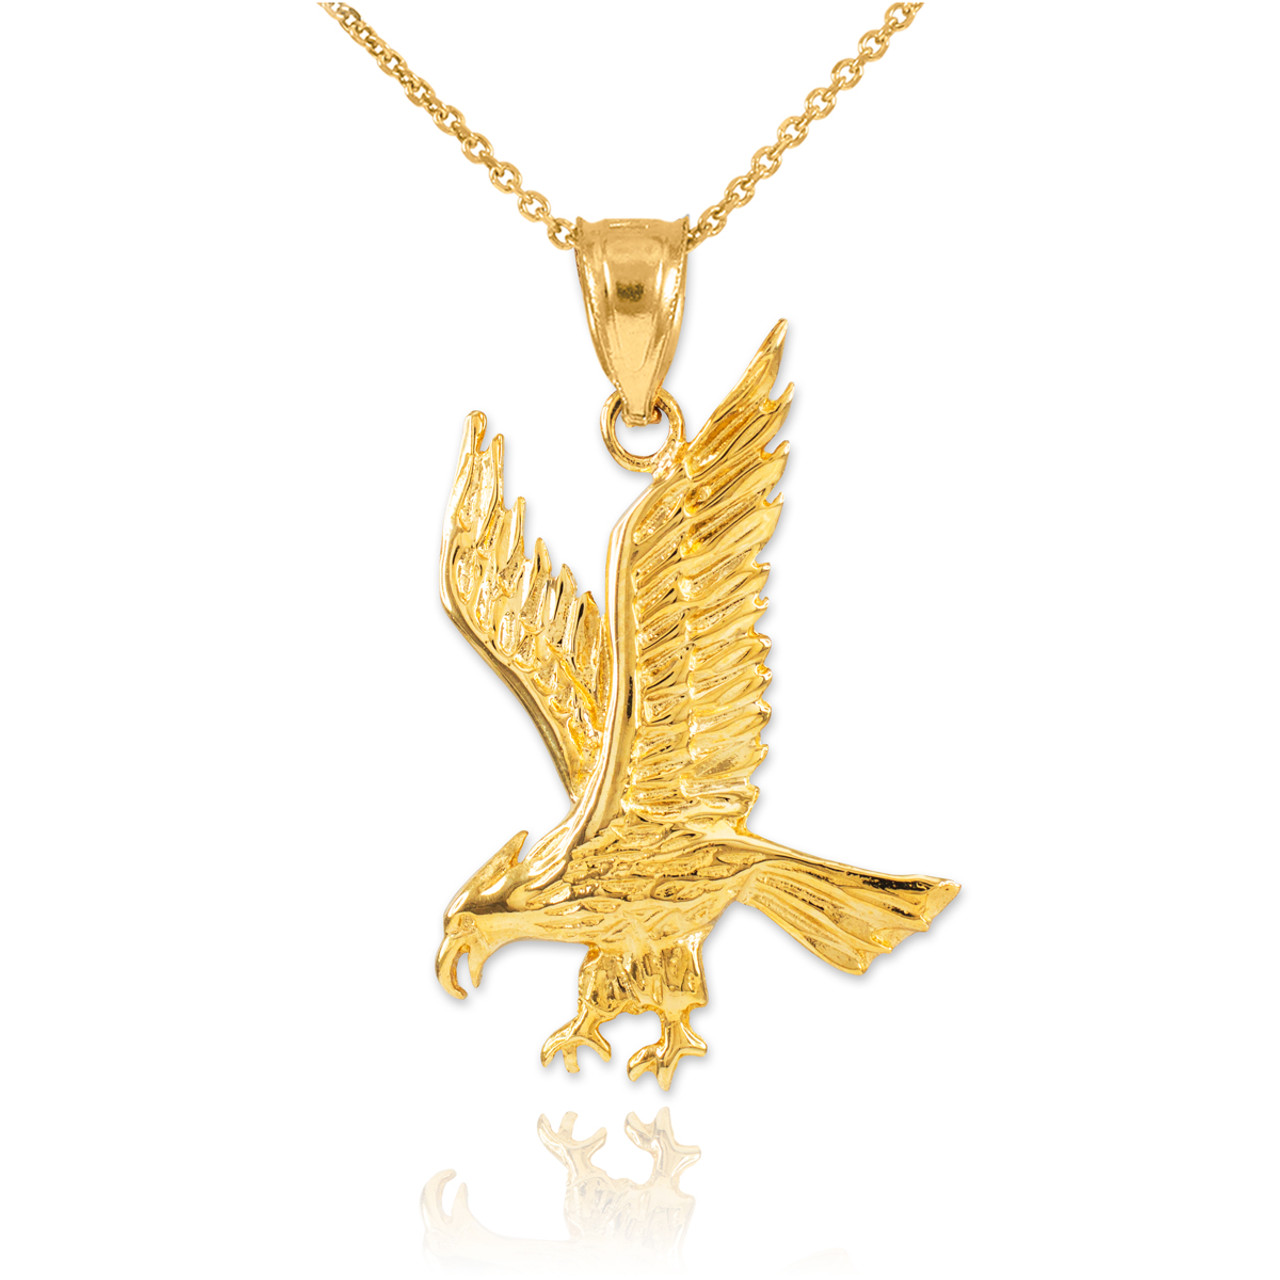 Solid gold eagle pendant necklace eagle pendants solid gold eagle pendant necklace aloadofball Gallery